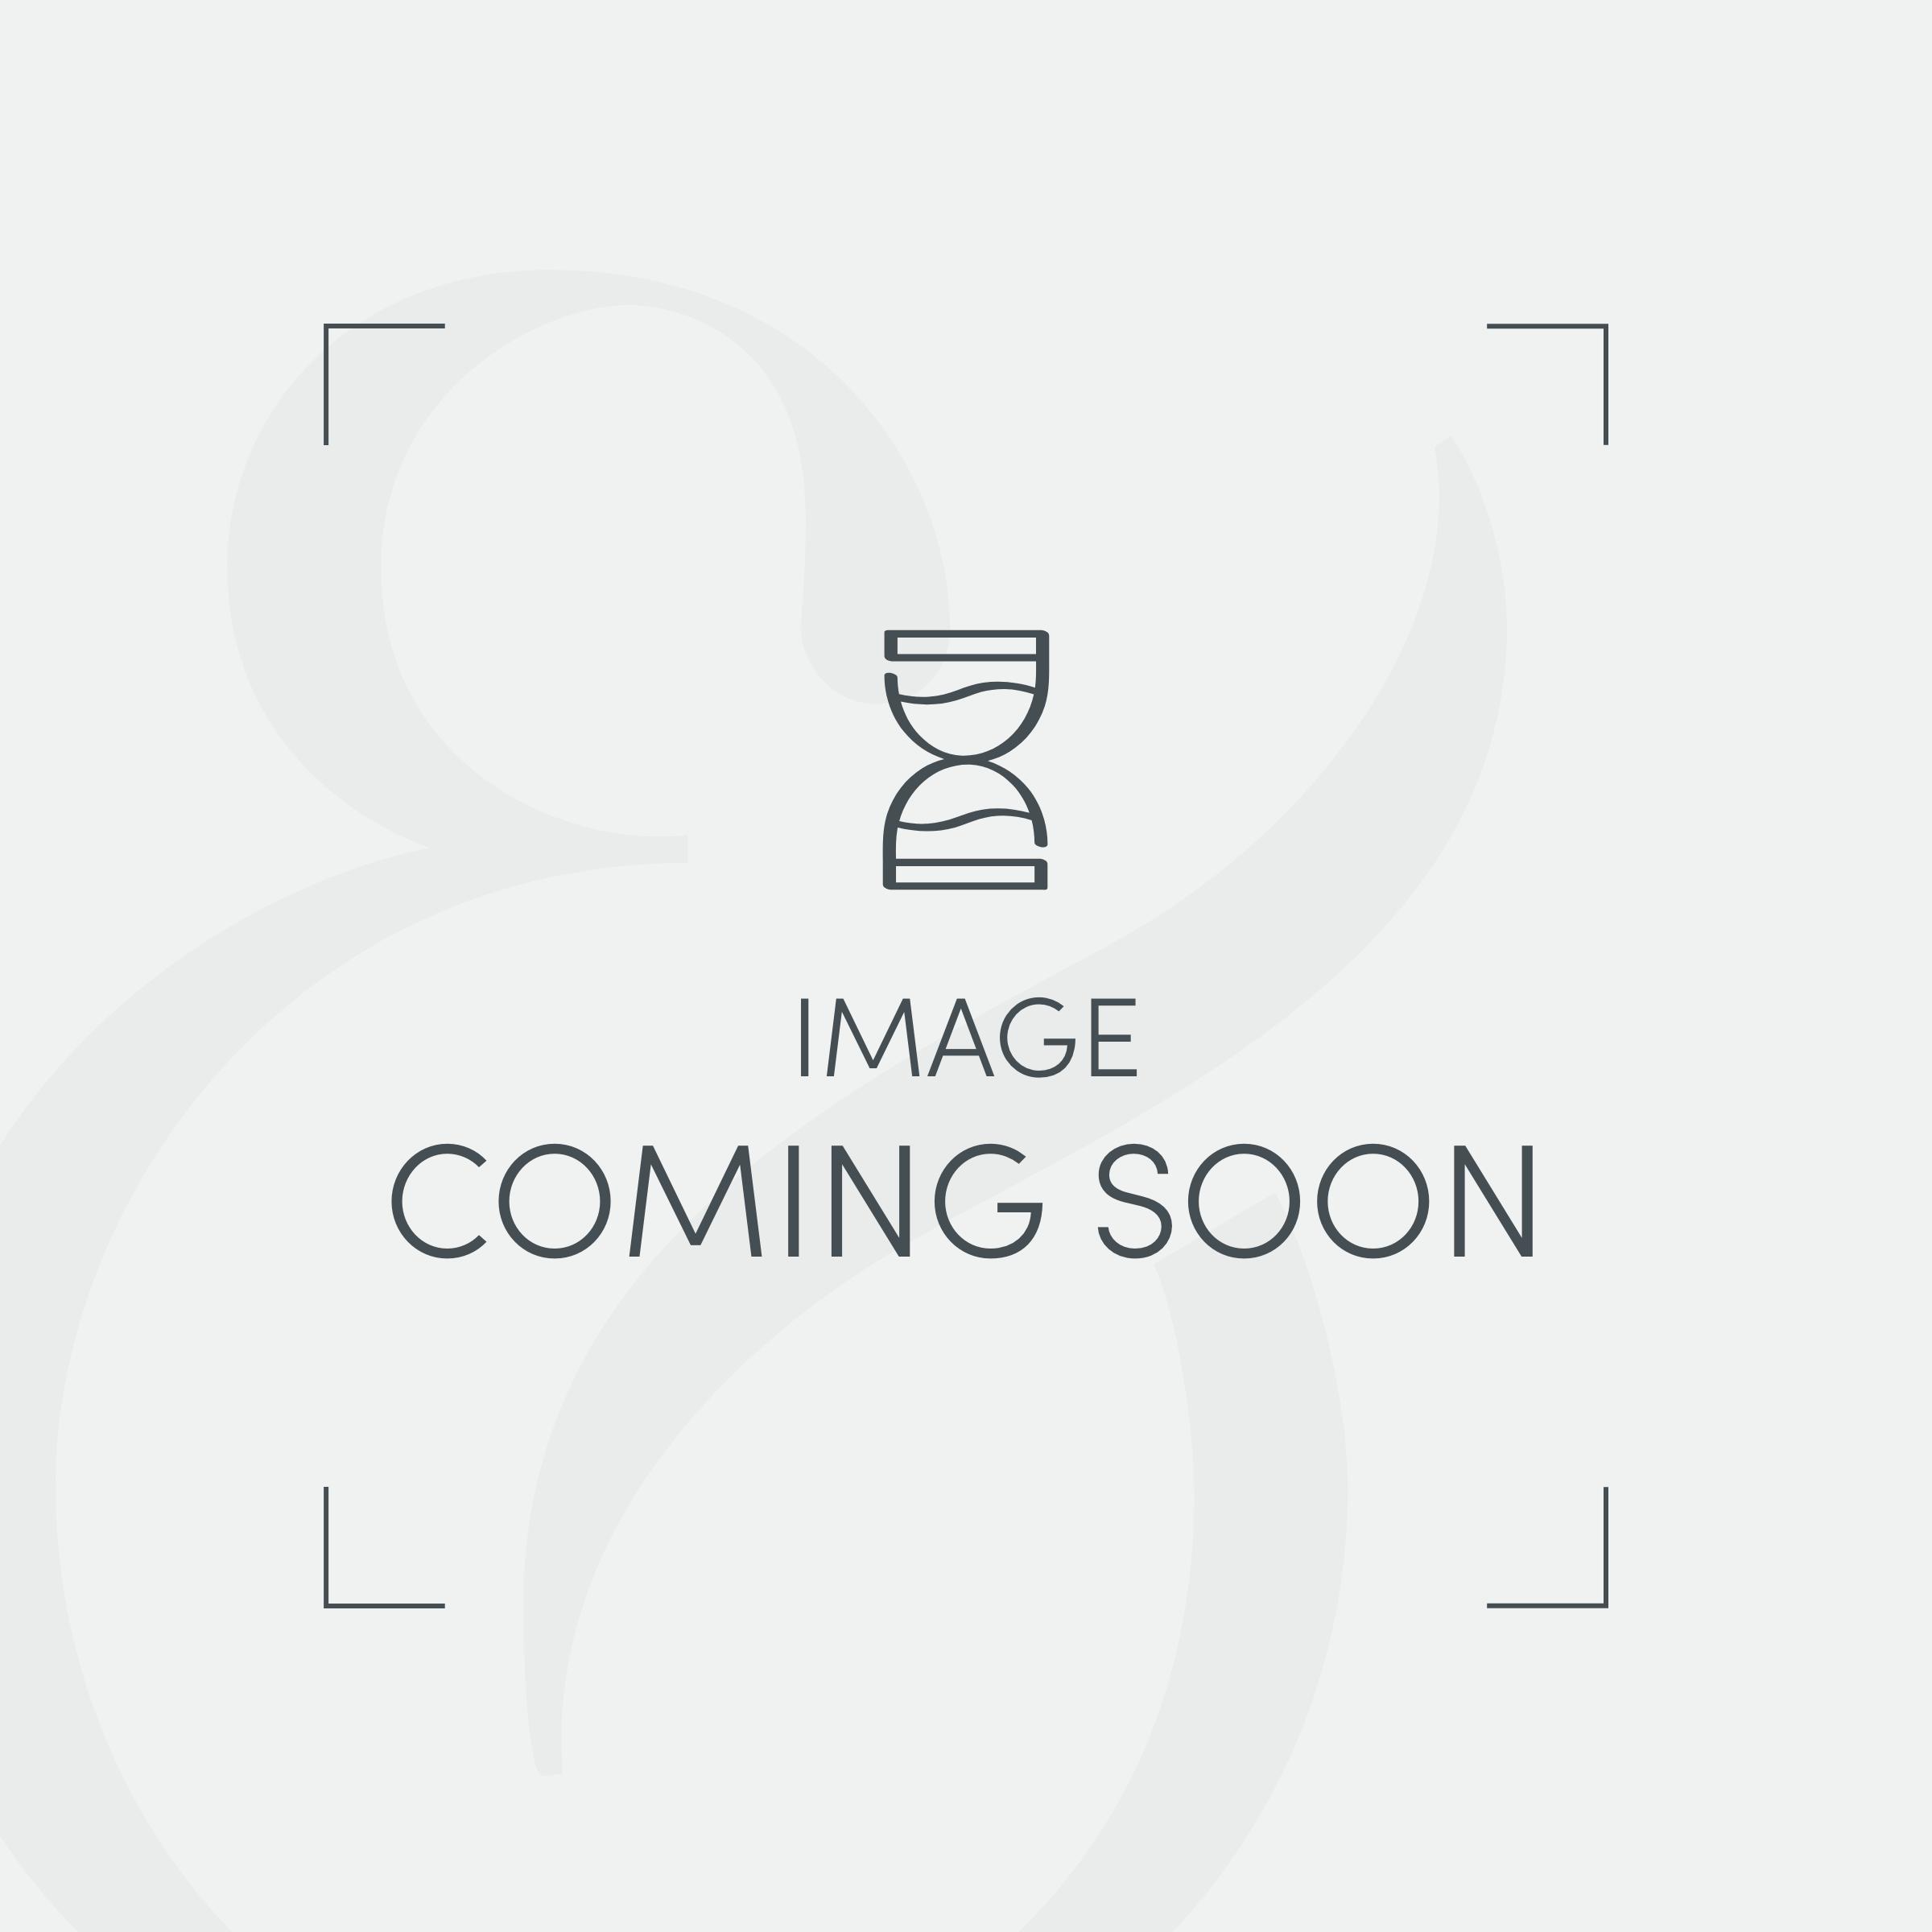 Waterproof Coolmax Pillow and Mattress Protectors